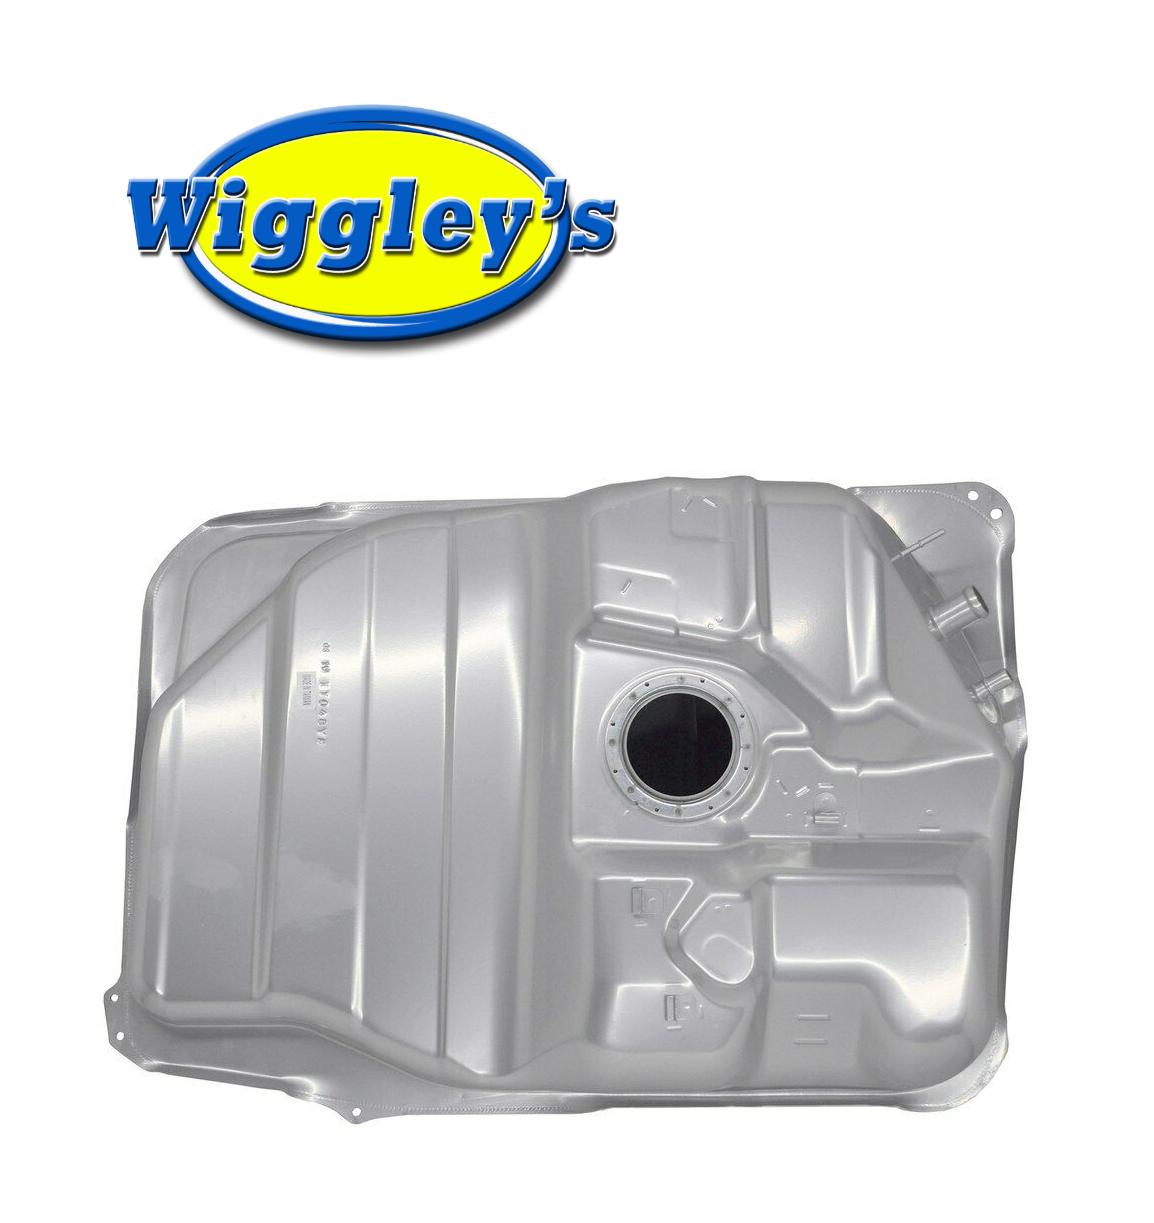 FUEL GAS TANK TOL-03 FOR 06 07 TOYOTA LAND CRUISER V8 4.7L